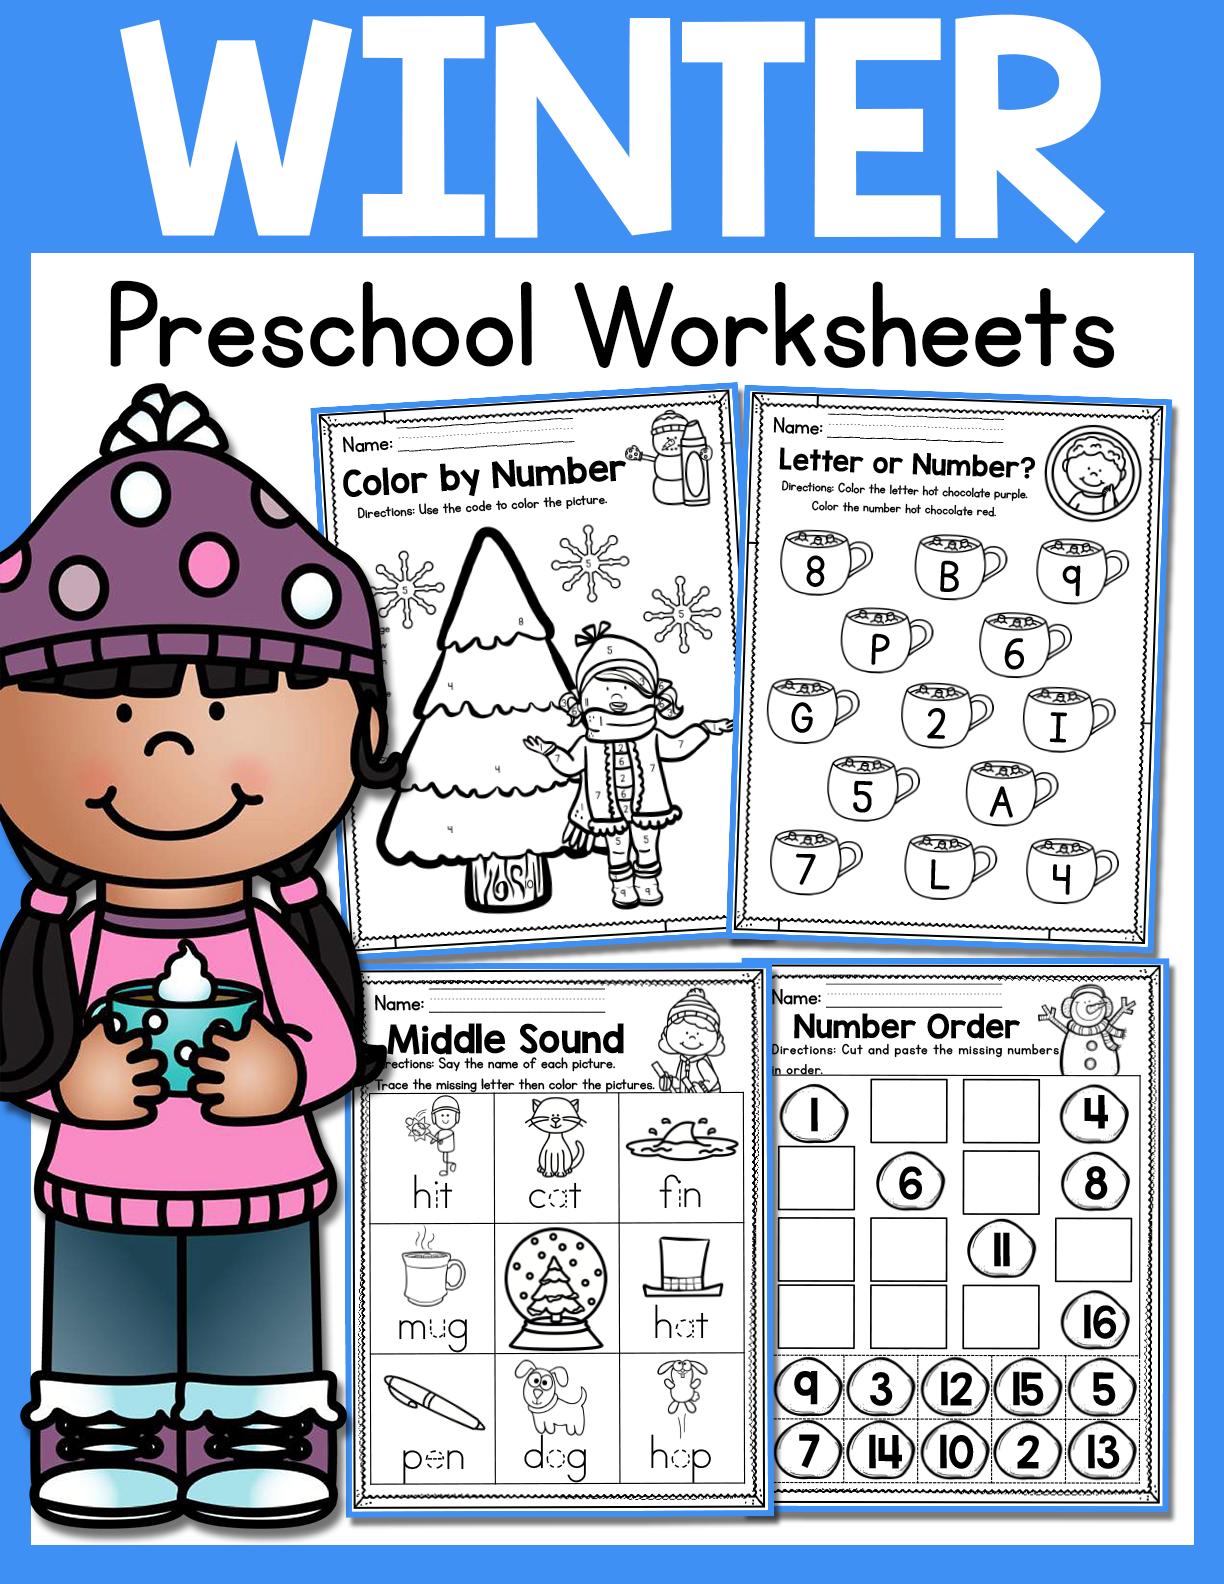 Winter Preschool Worksheets January